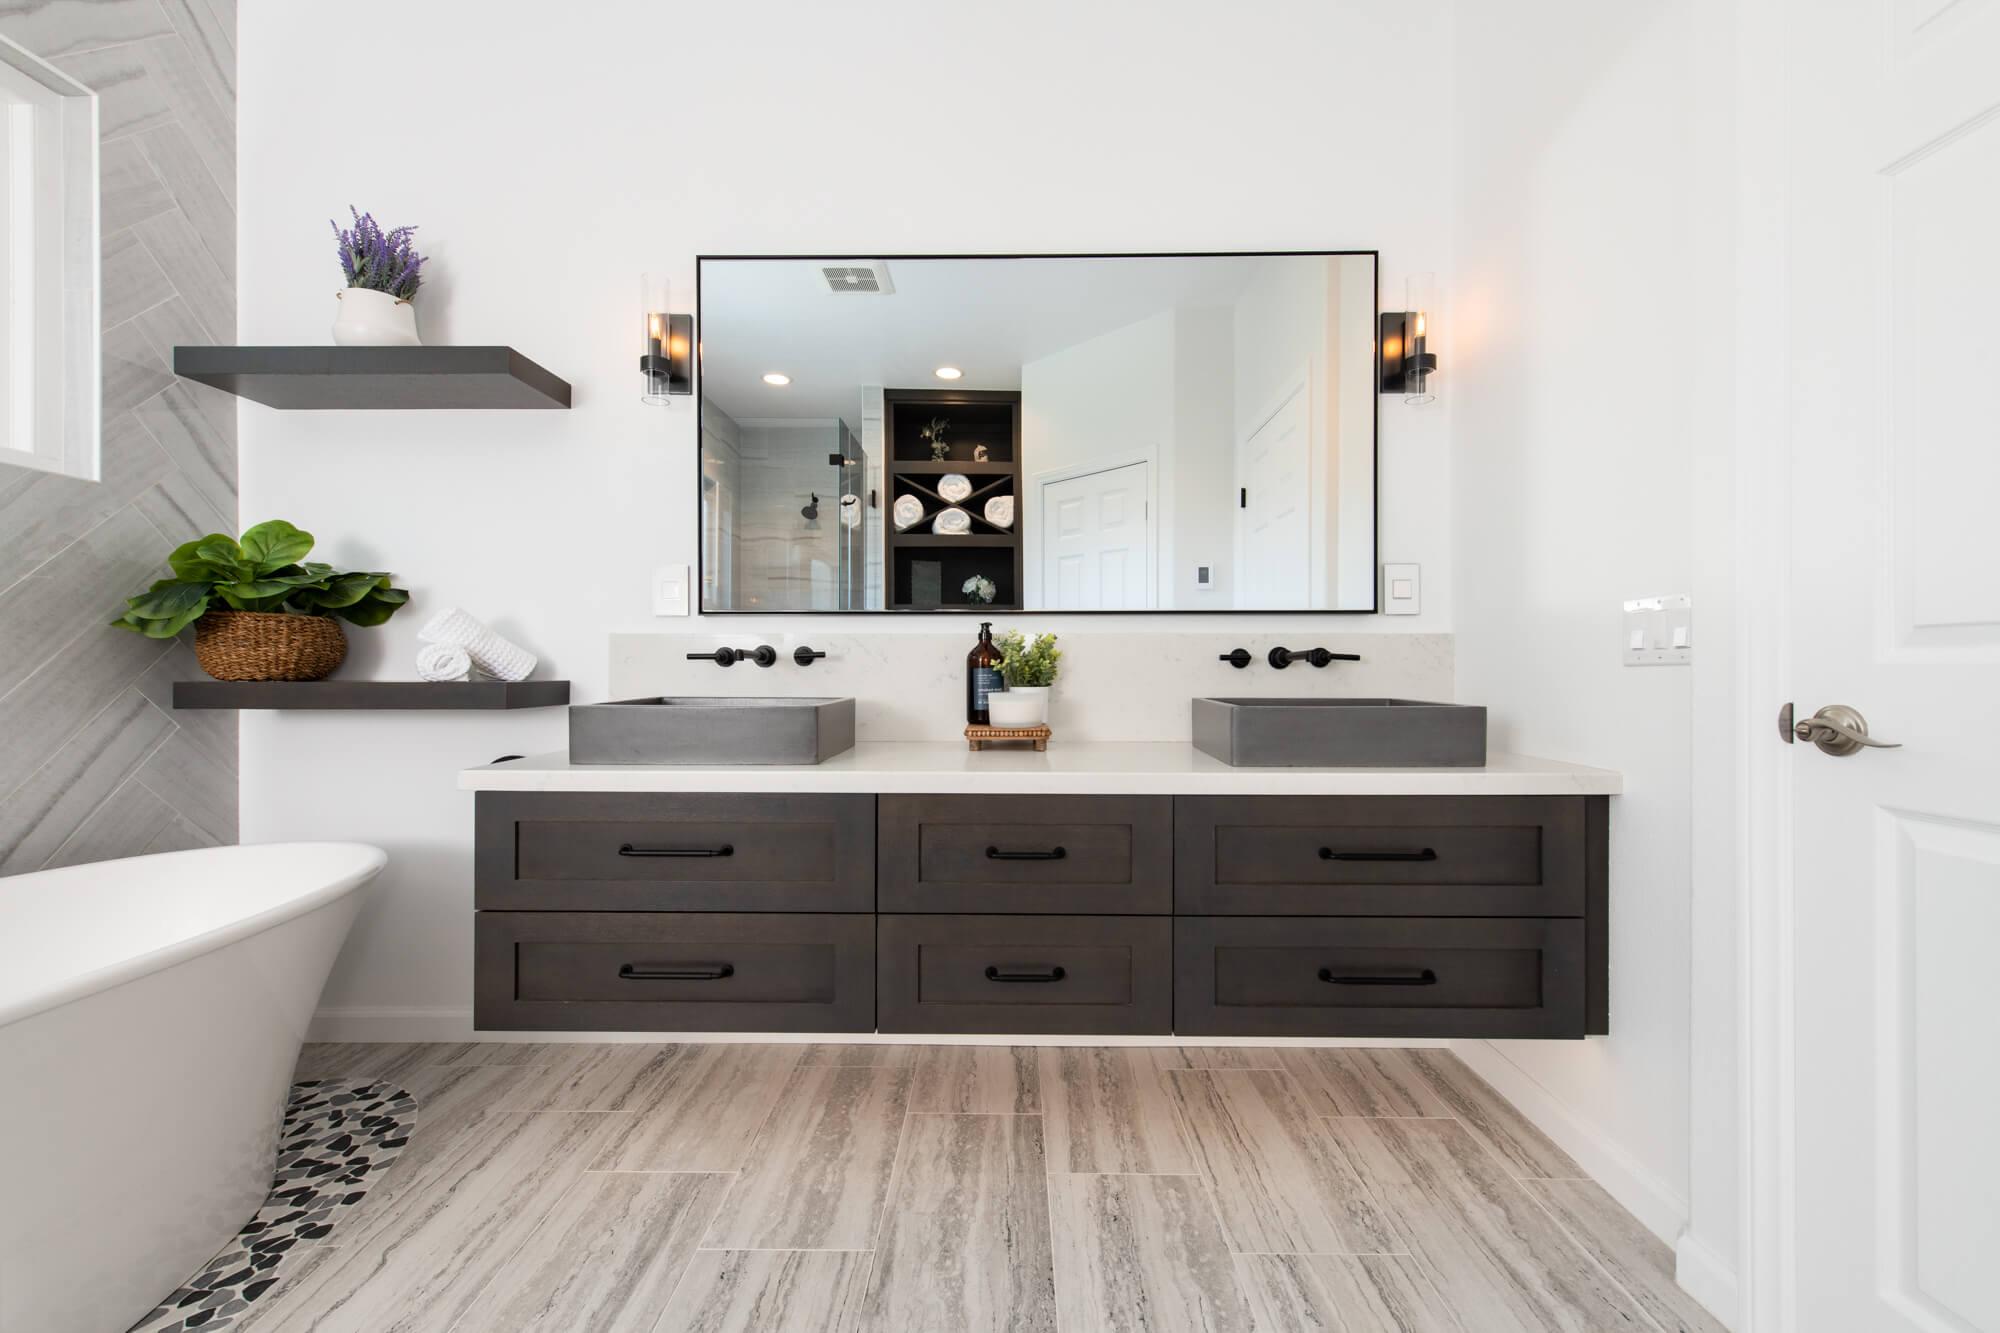 Floating bathroom vanity remodel with undercabinet lightingremodel